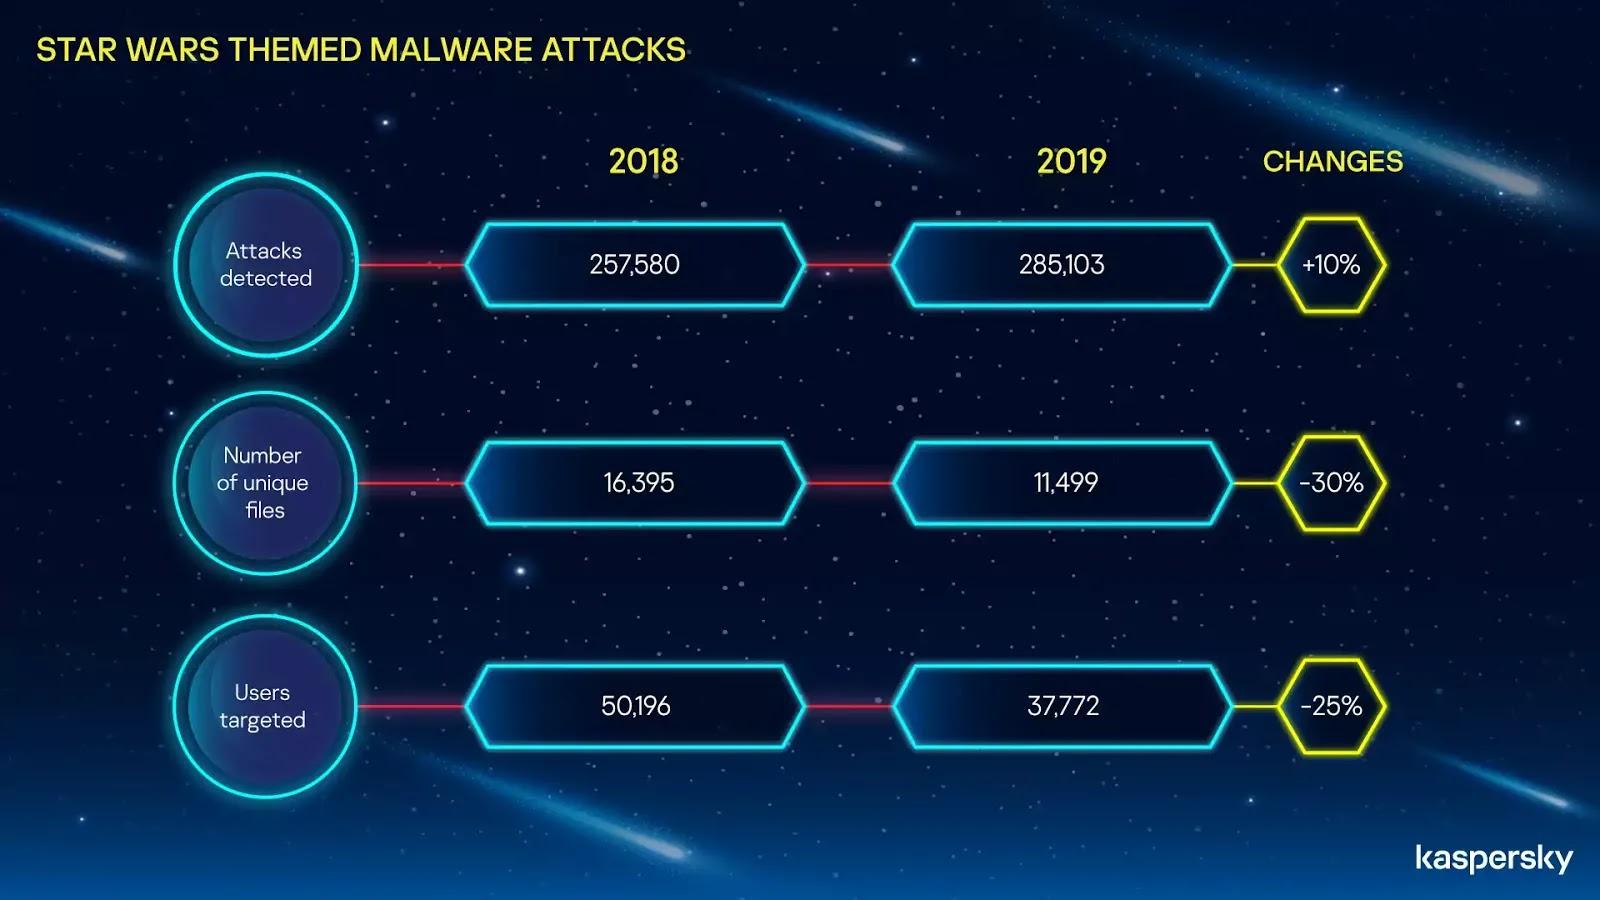 Star Wars-themed malware attacks